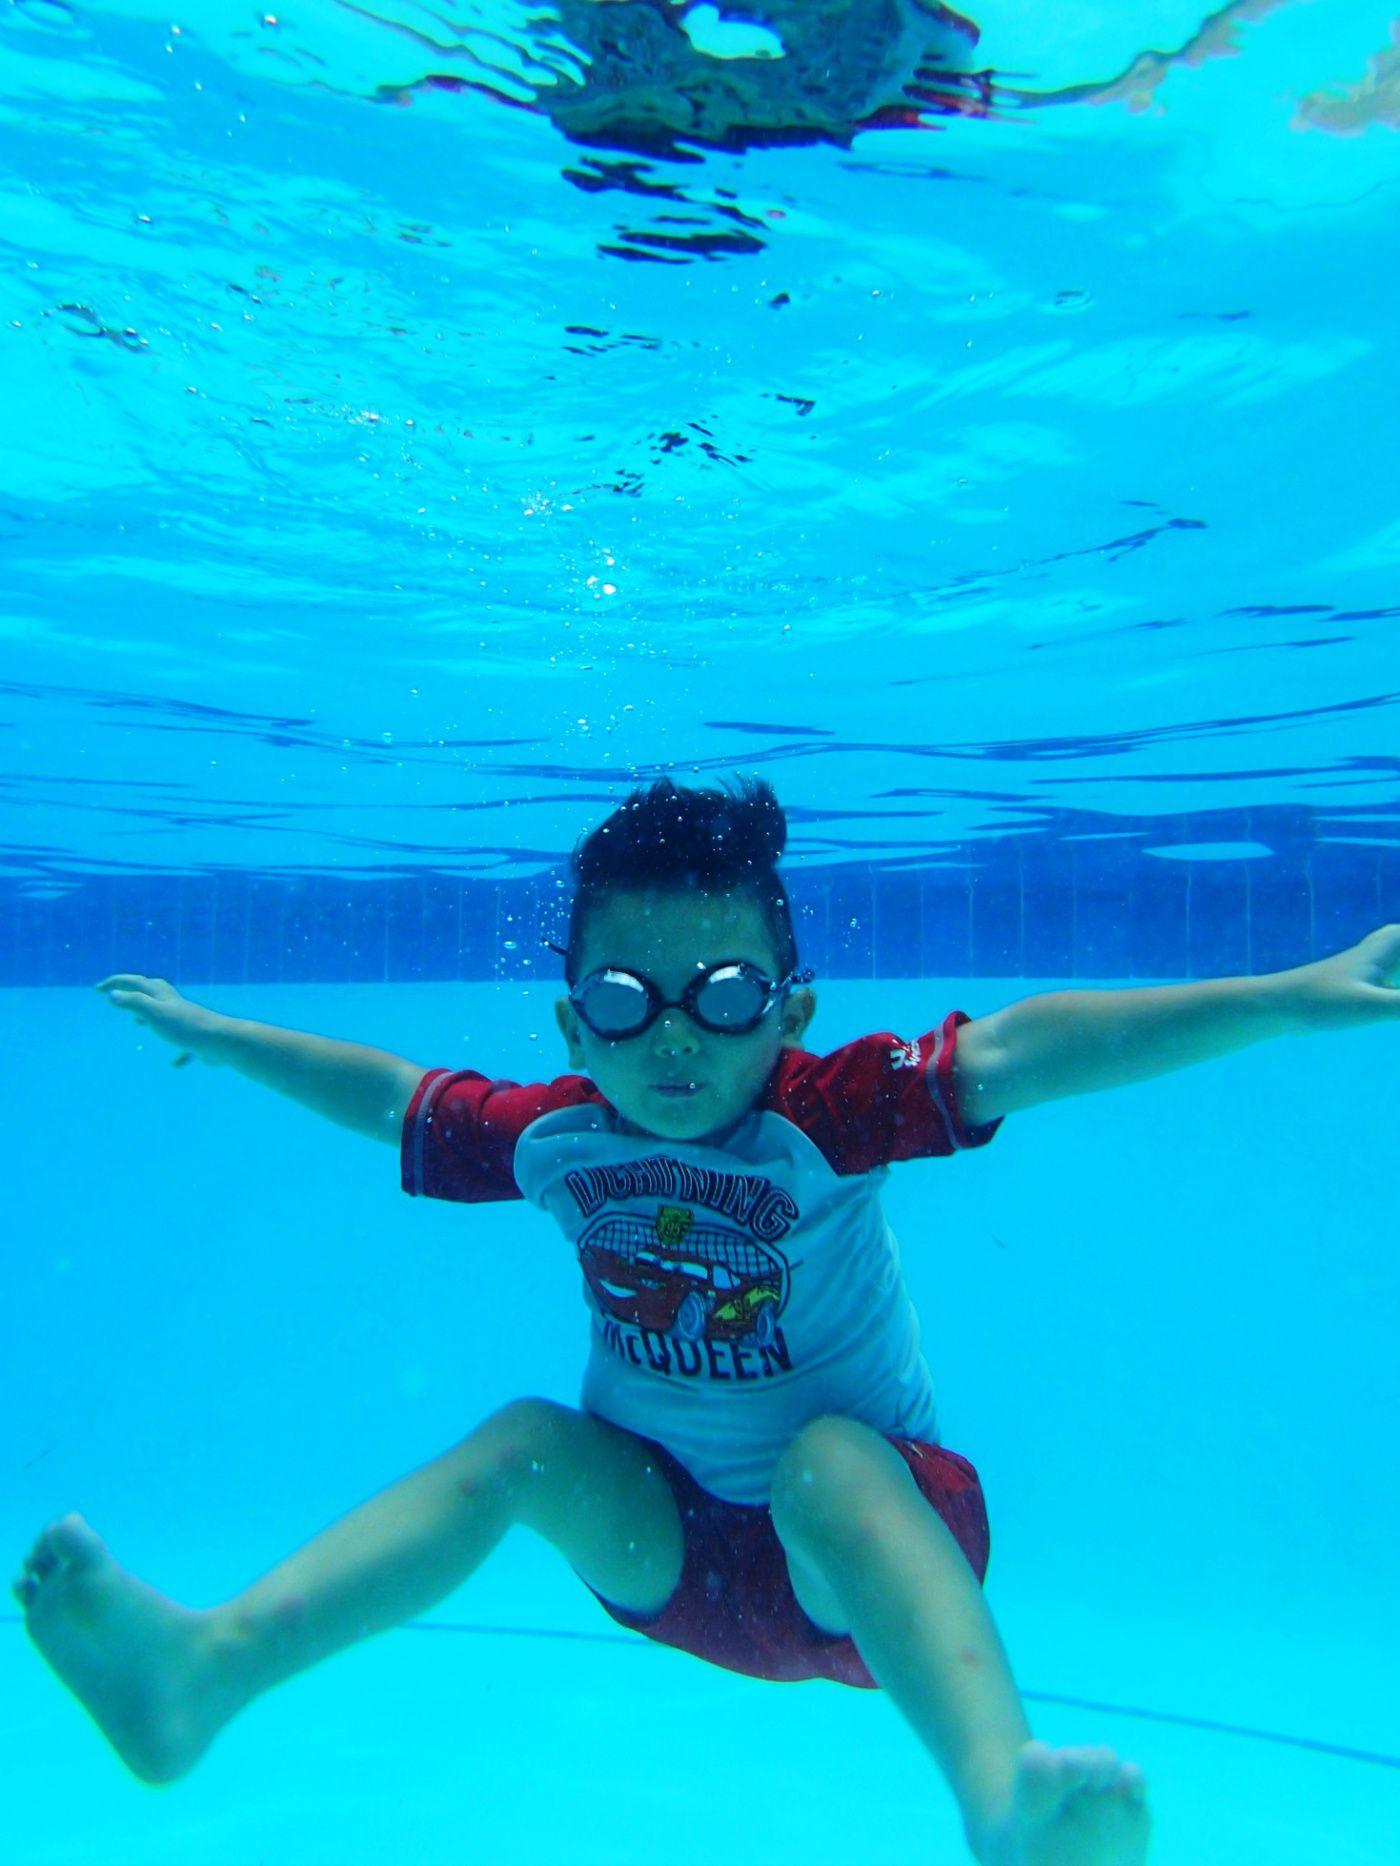 Swimming Lessons Swim Lessons Private Swim Lessons Swimming